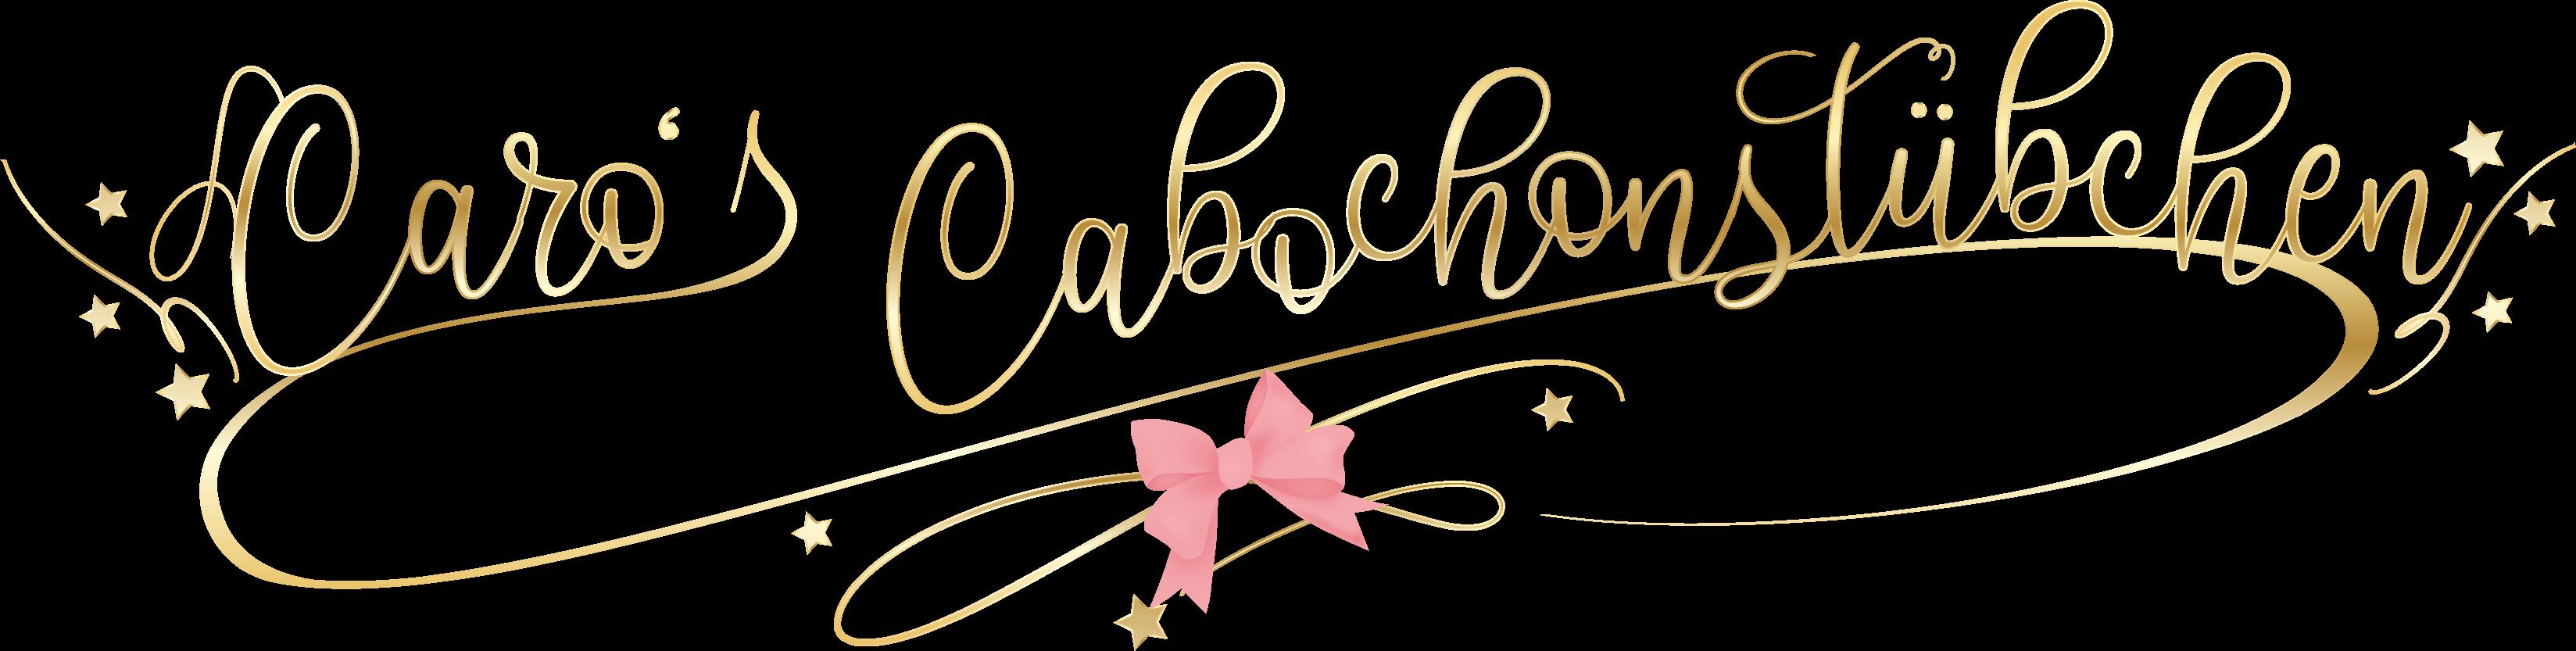 Caro's Cabochonstübchen